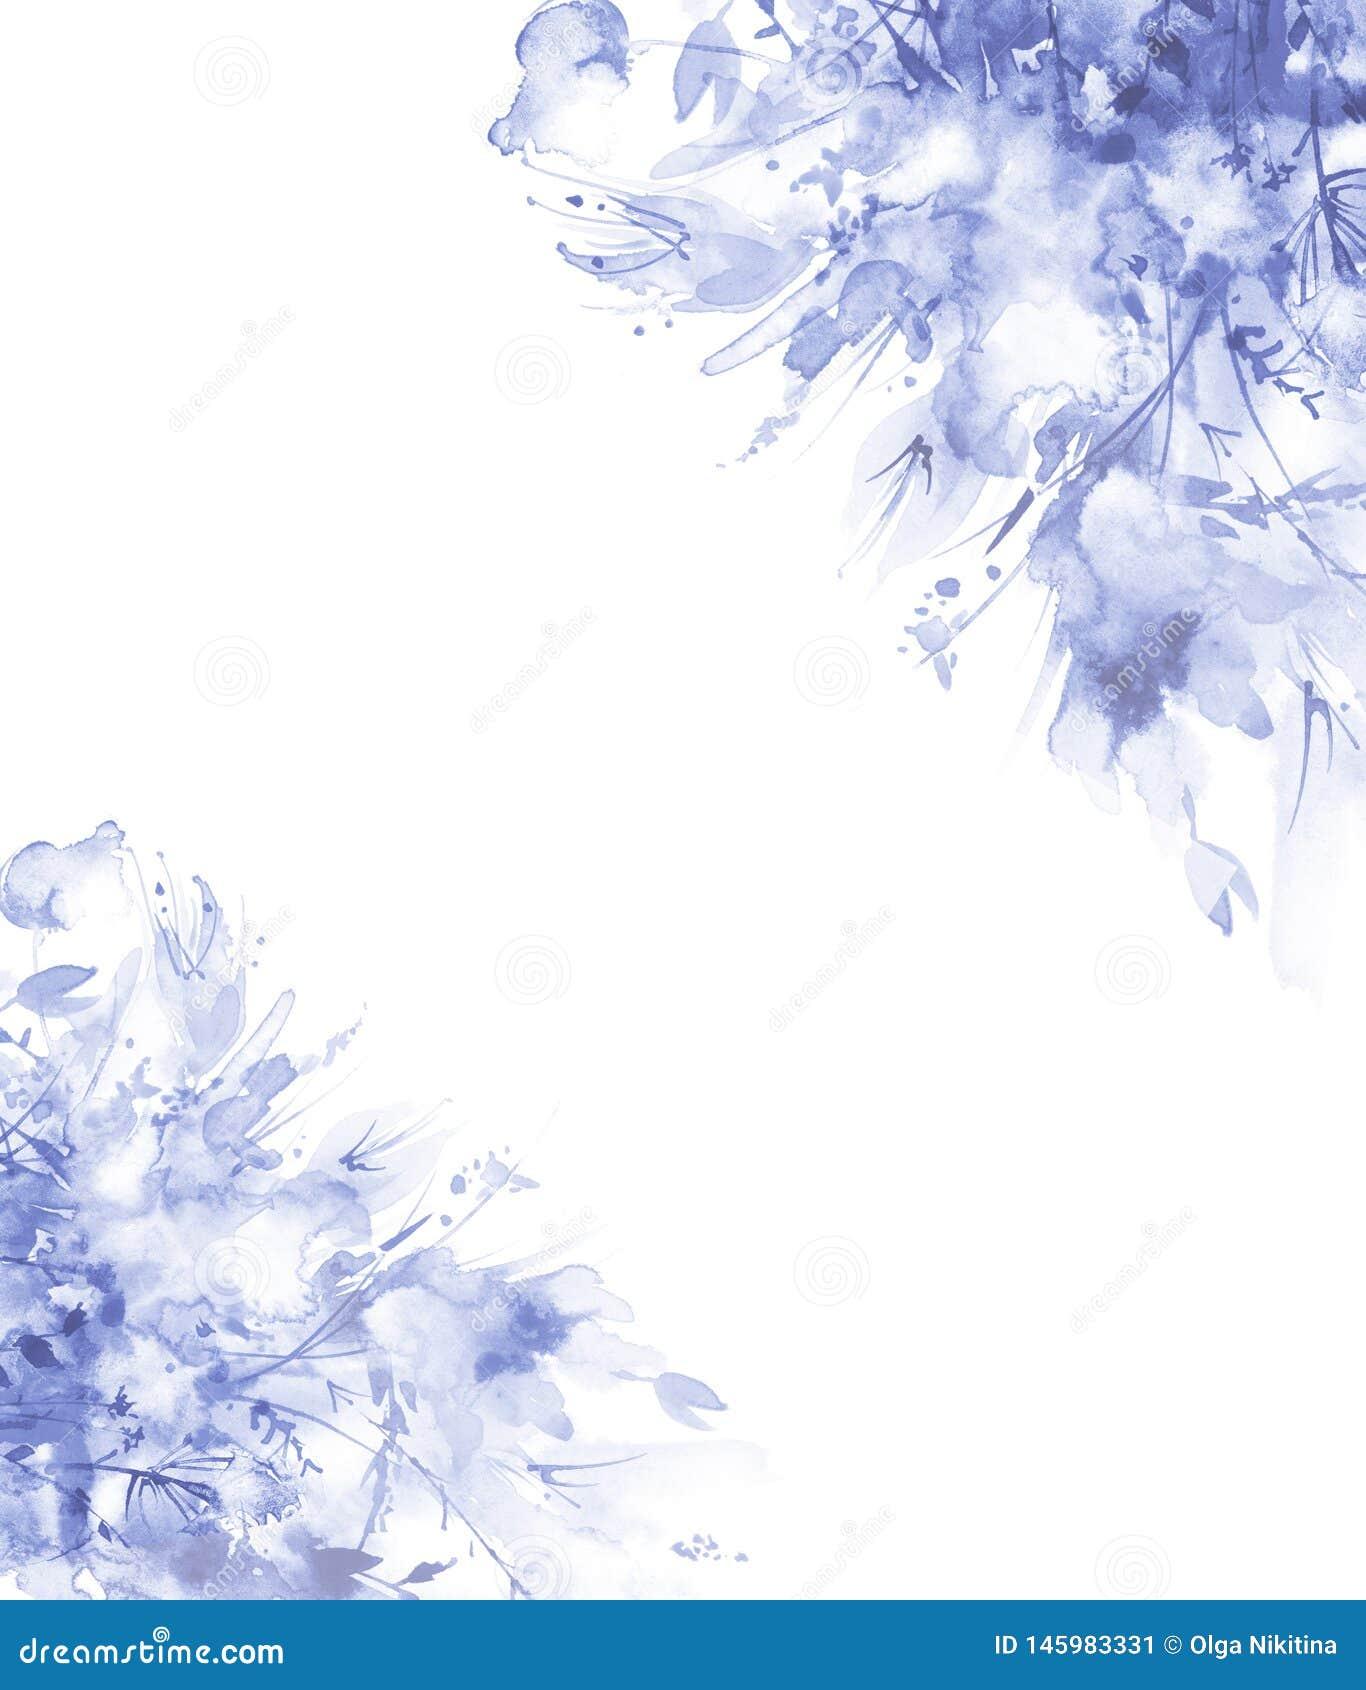 Vattenf?rgbukett av blommor, h?rlig abstrakt f?rgst?nk av m?larf?rg, modeillustration Orkid?blommor, vallmo, bl?klint